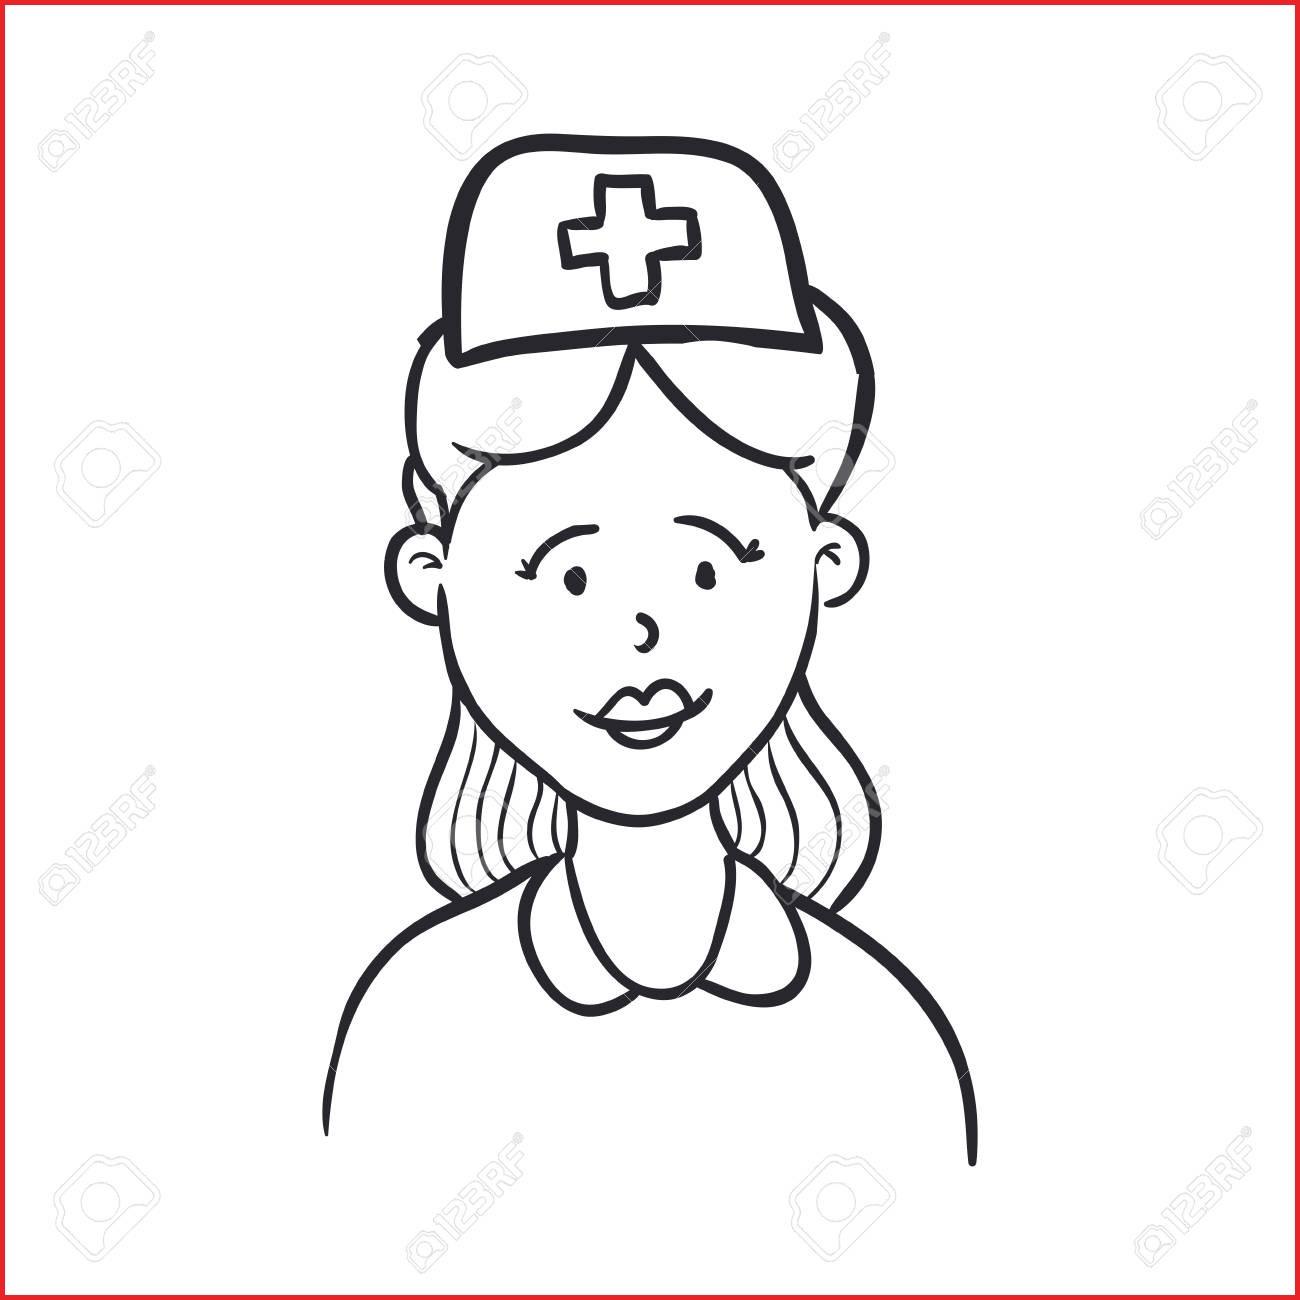 1300x1300 Nurse Drawing 129811 Nurse Draw Cartoon Icon Vector Illustration